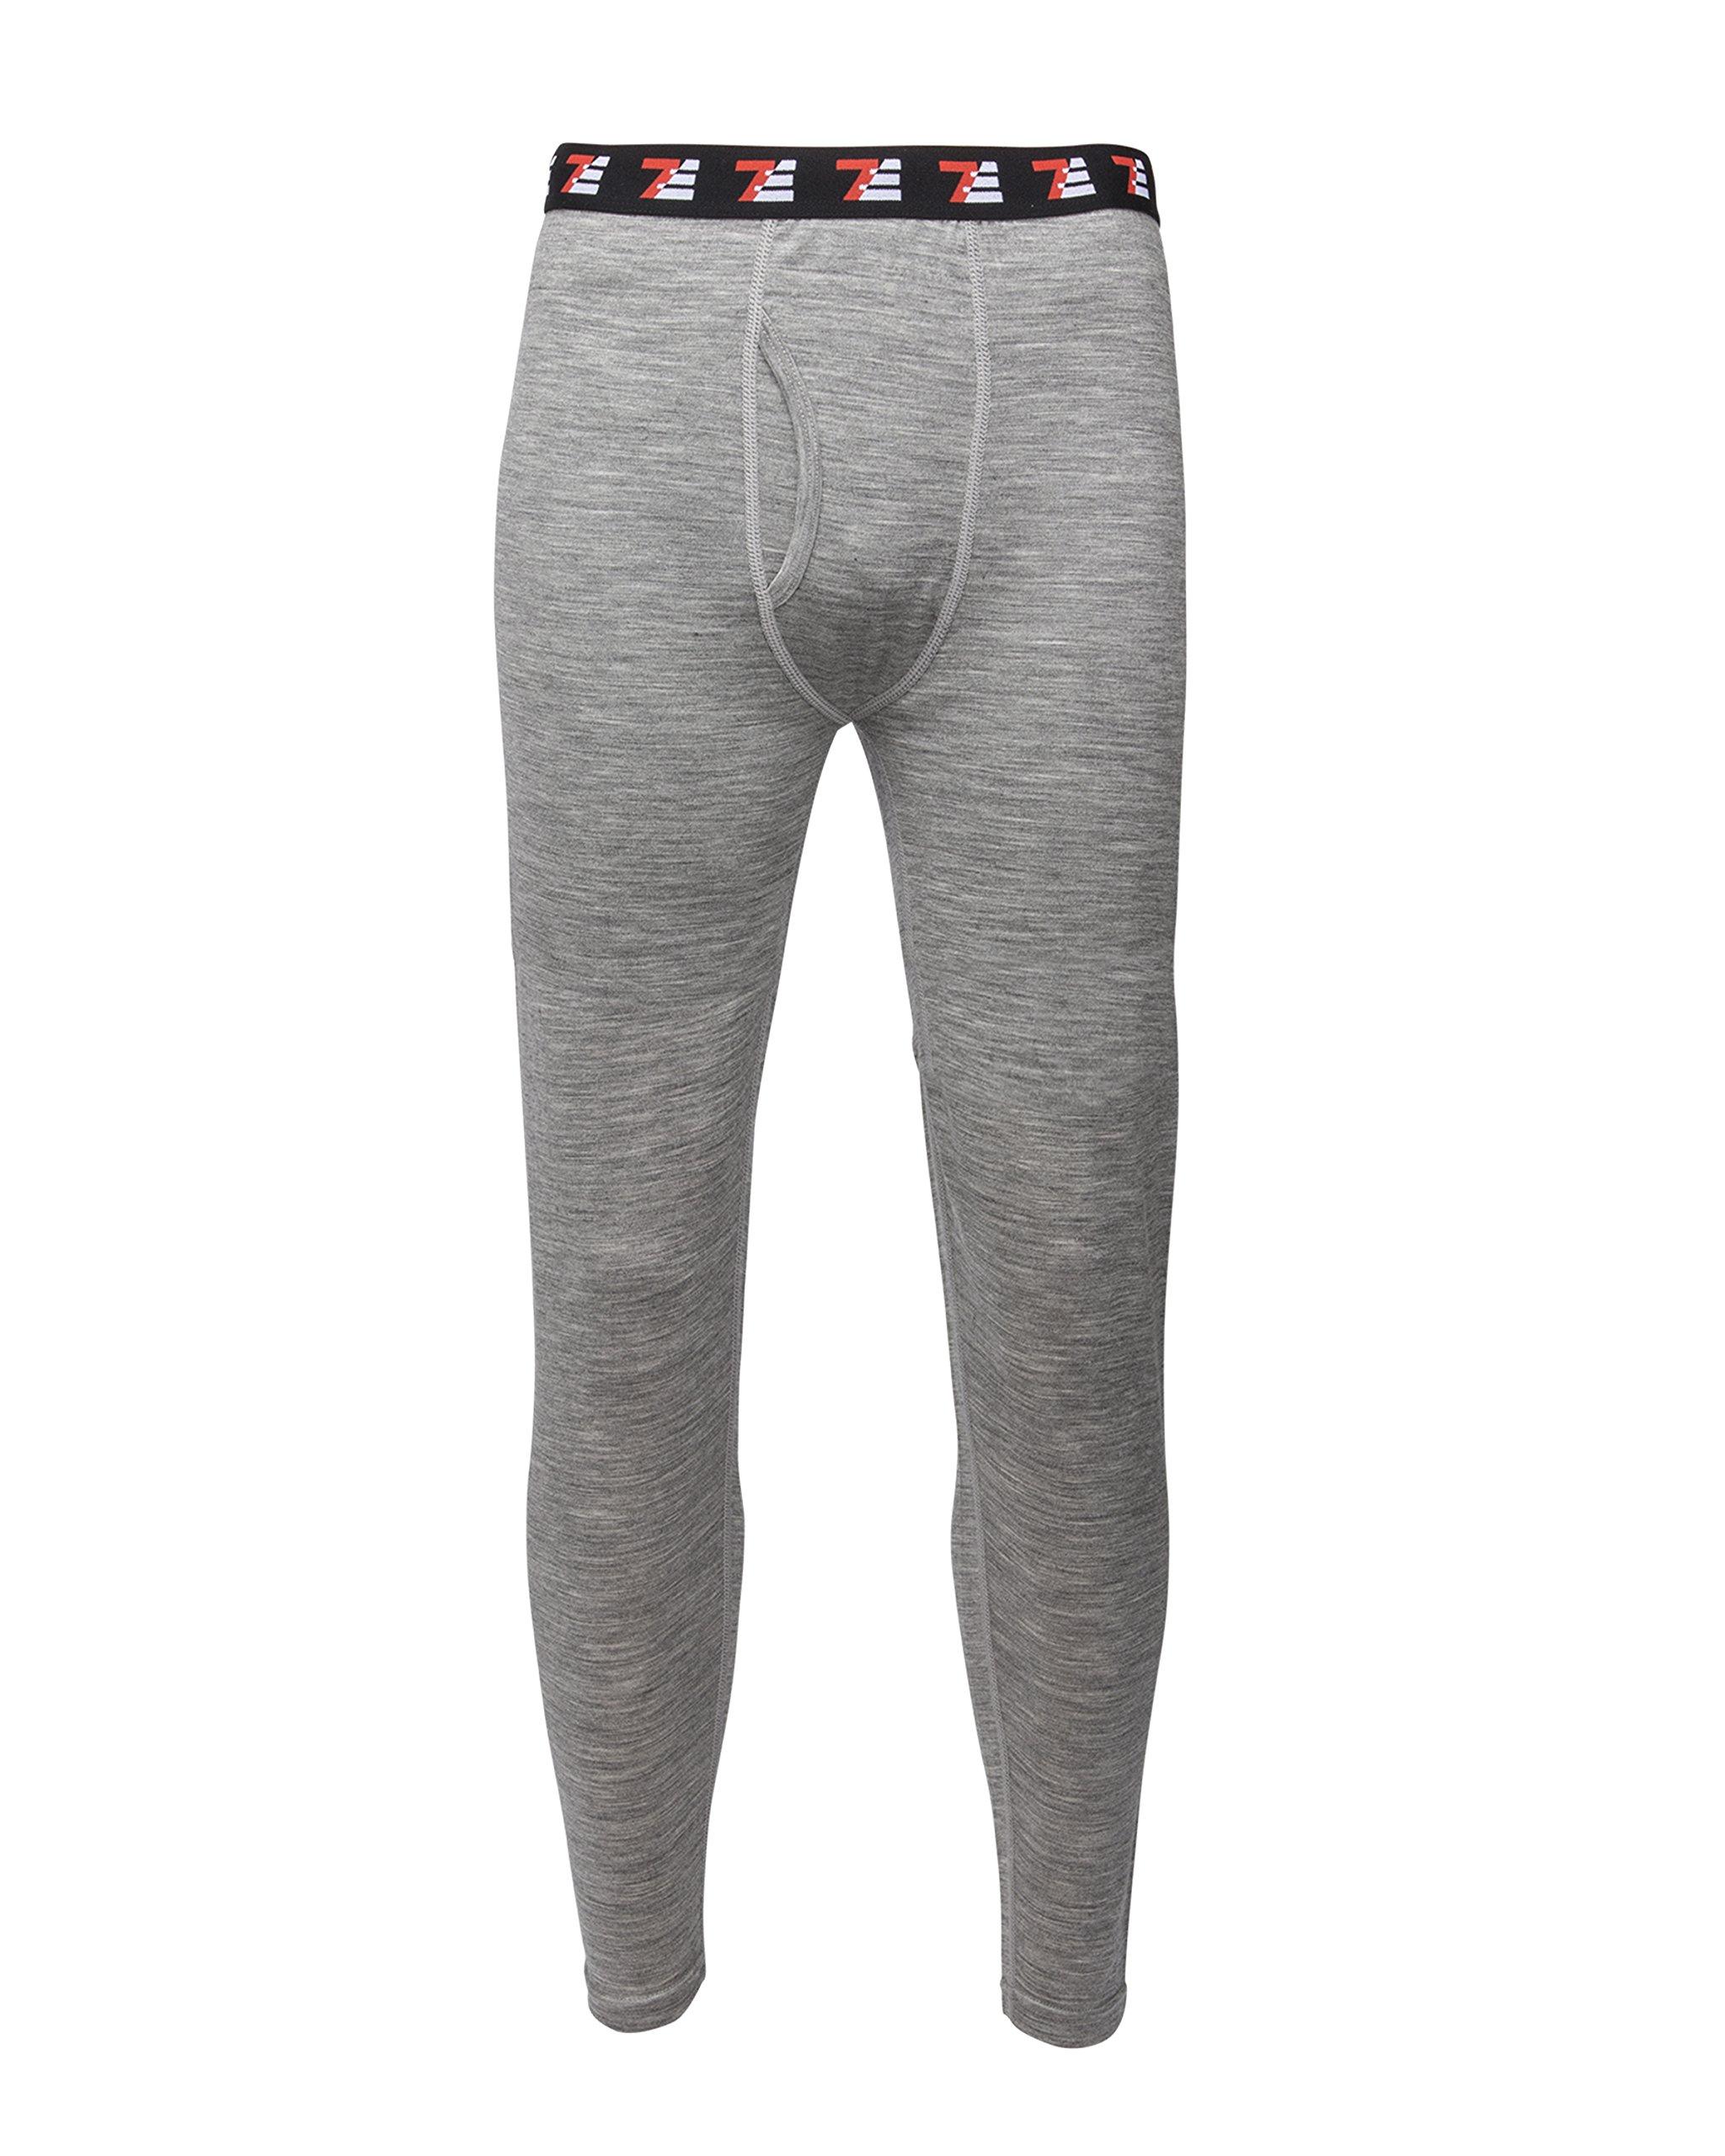 7EVEN 100% Merino Wool Mens Base Layer Bottom (Grey, XL)